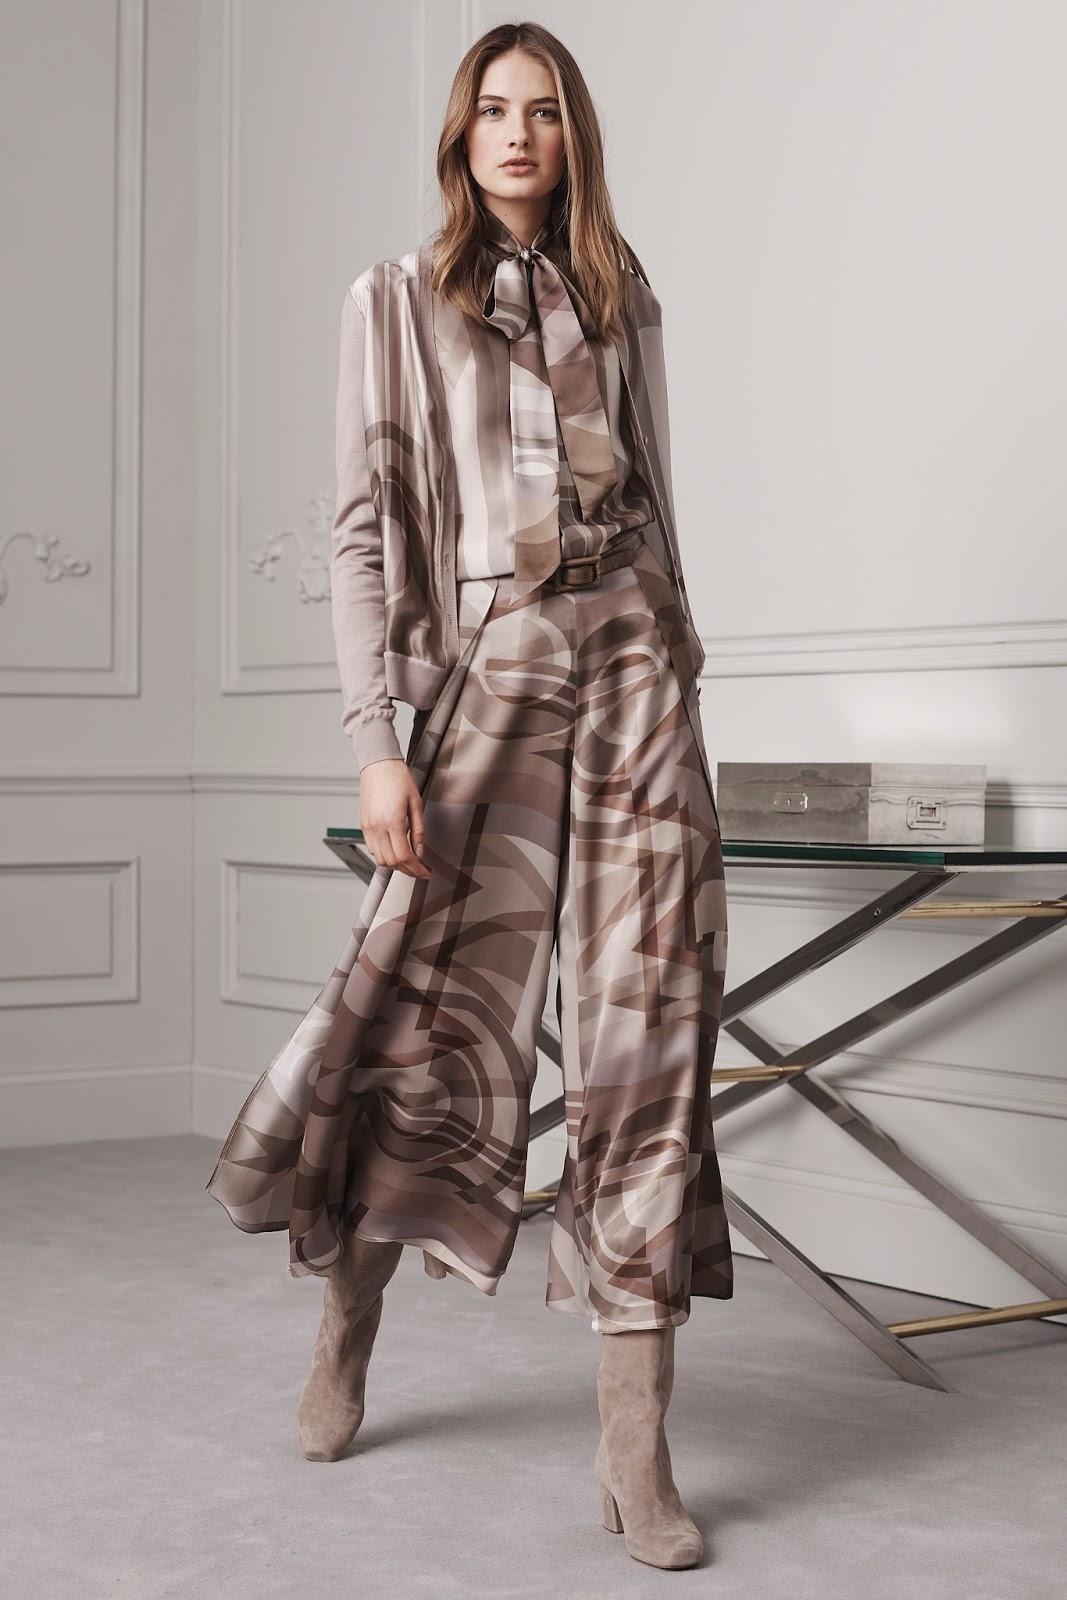 Ralph lauren influence on fashion 7